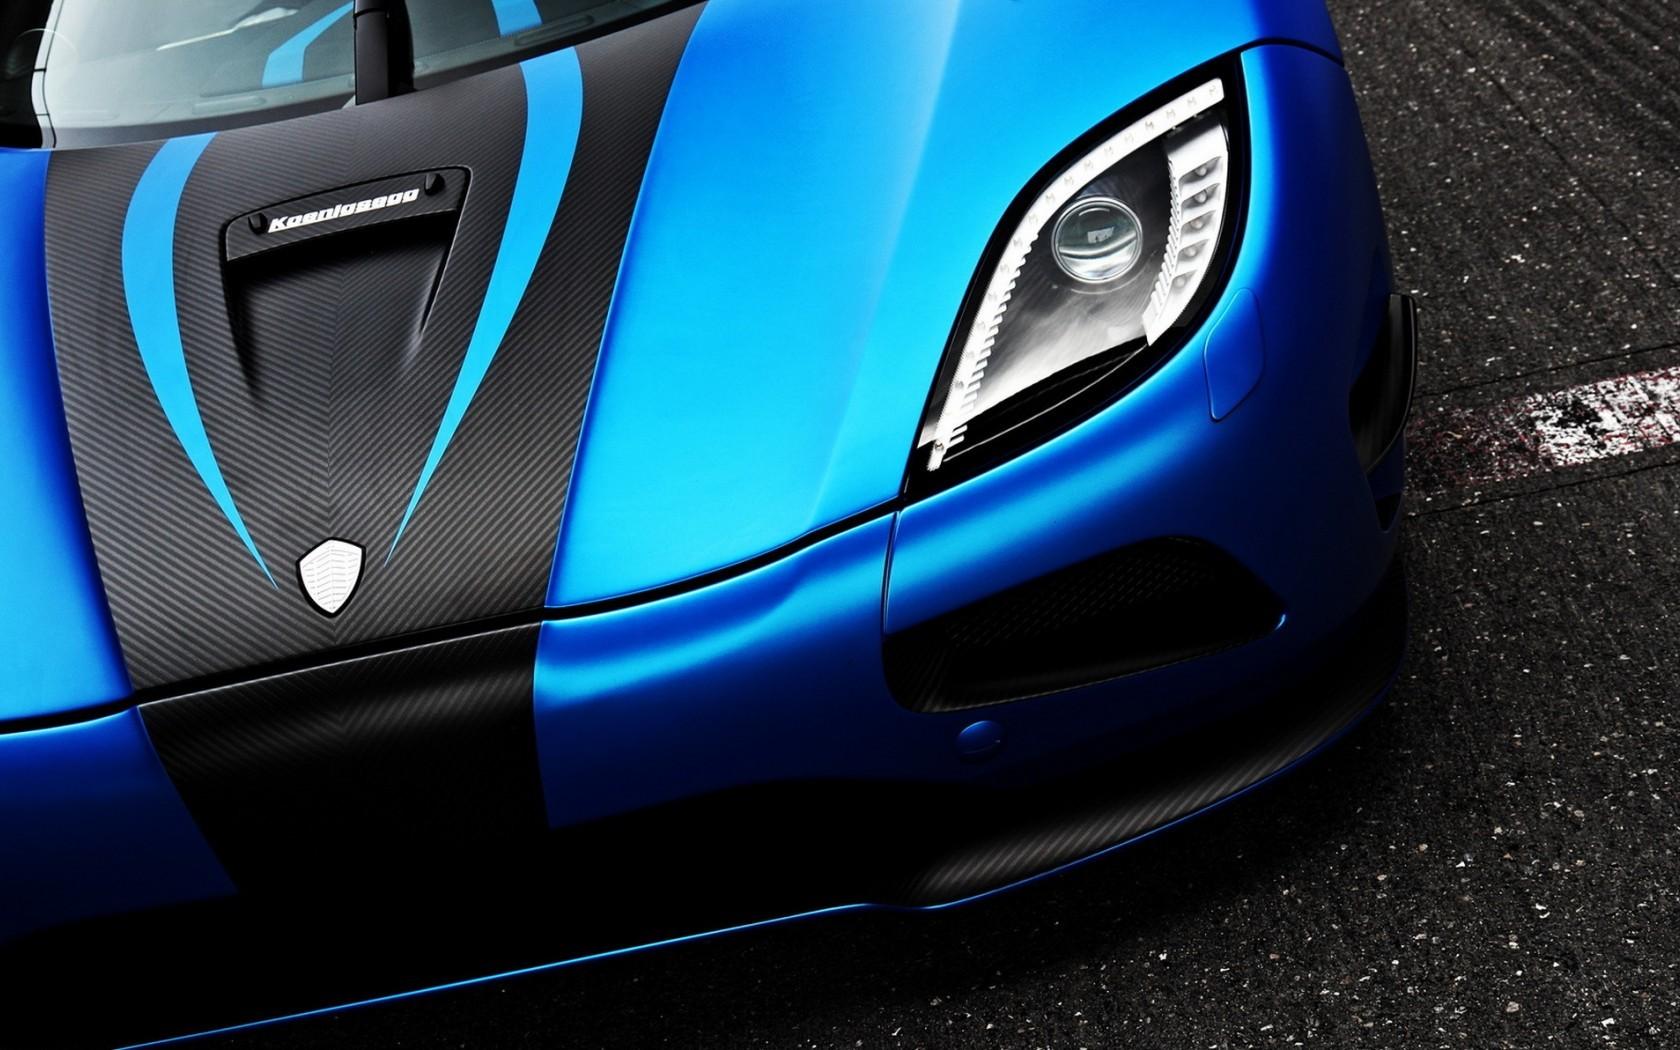 Koenigsegg Agera R Wallpaper Blue Amazing Wallpapers 1680x1050